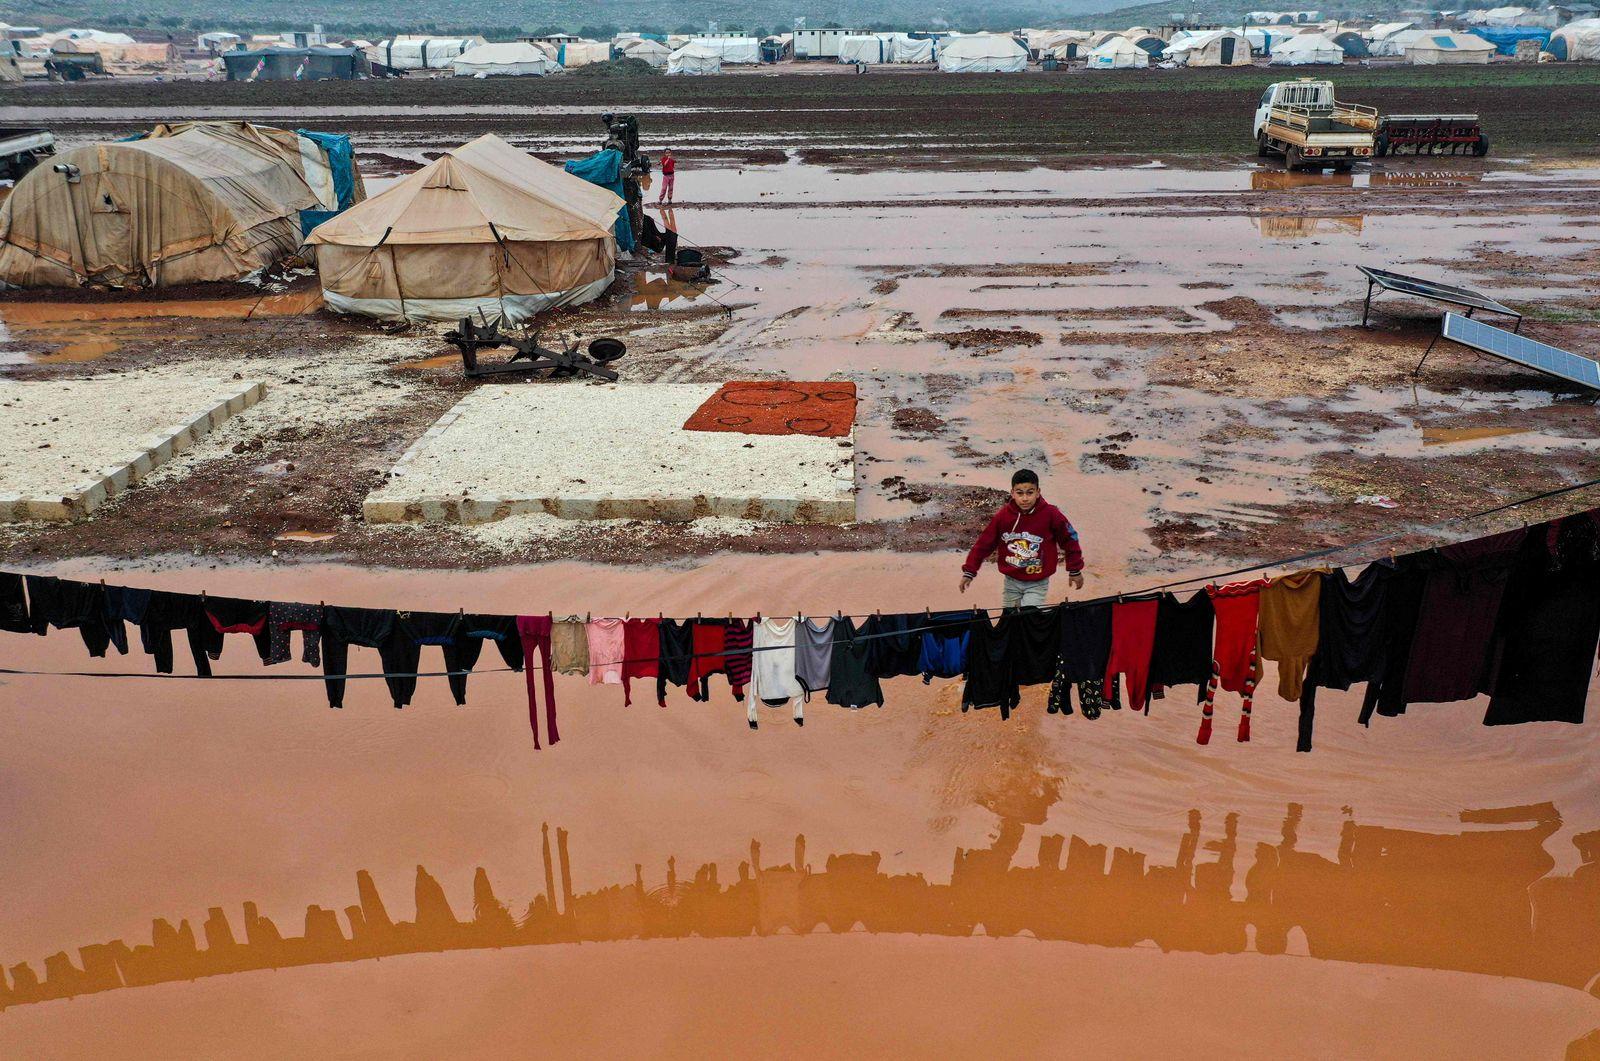 TOPSHOT-SYRIA-CONFLICT-IDLIB-DISPLACED-WEATHER-FLOOD